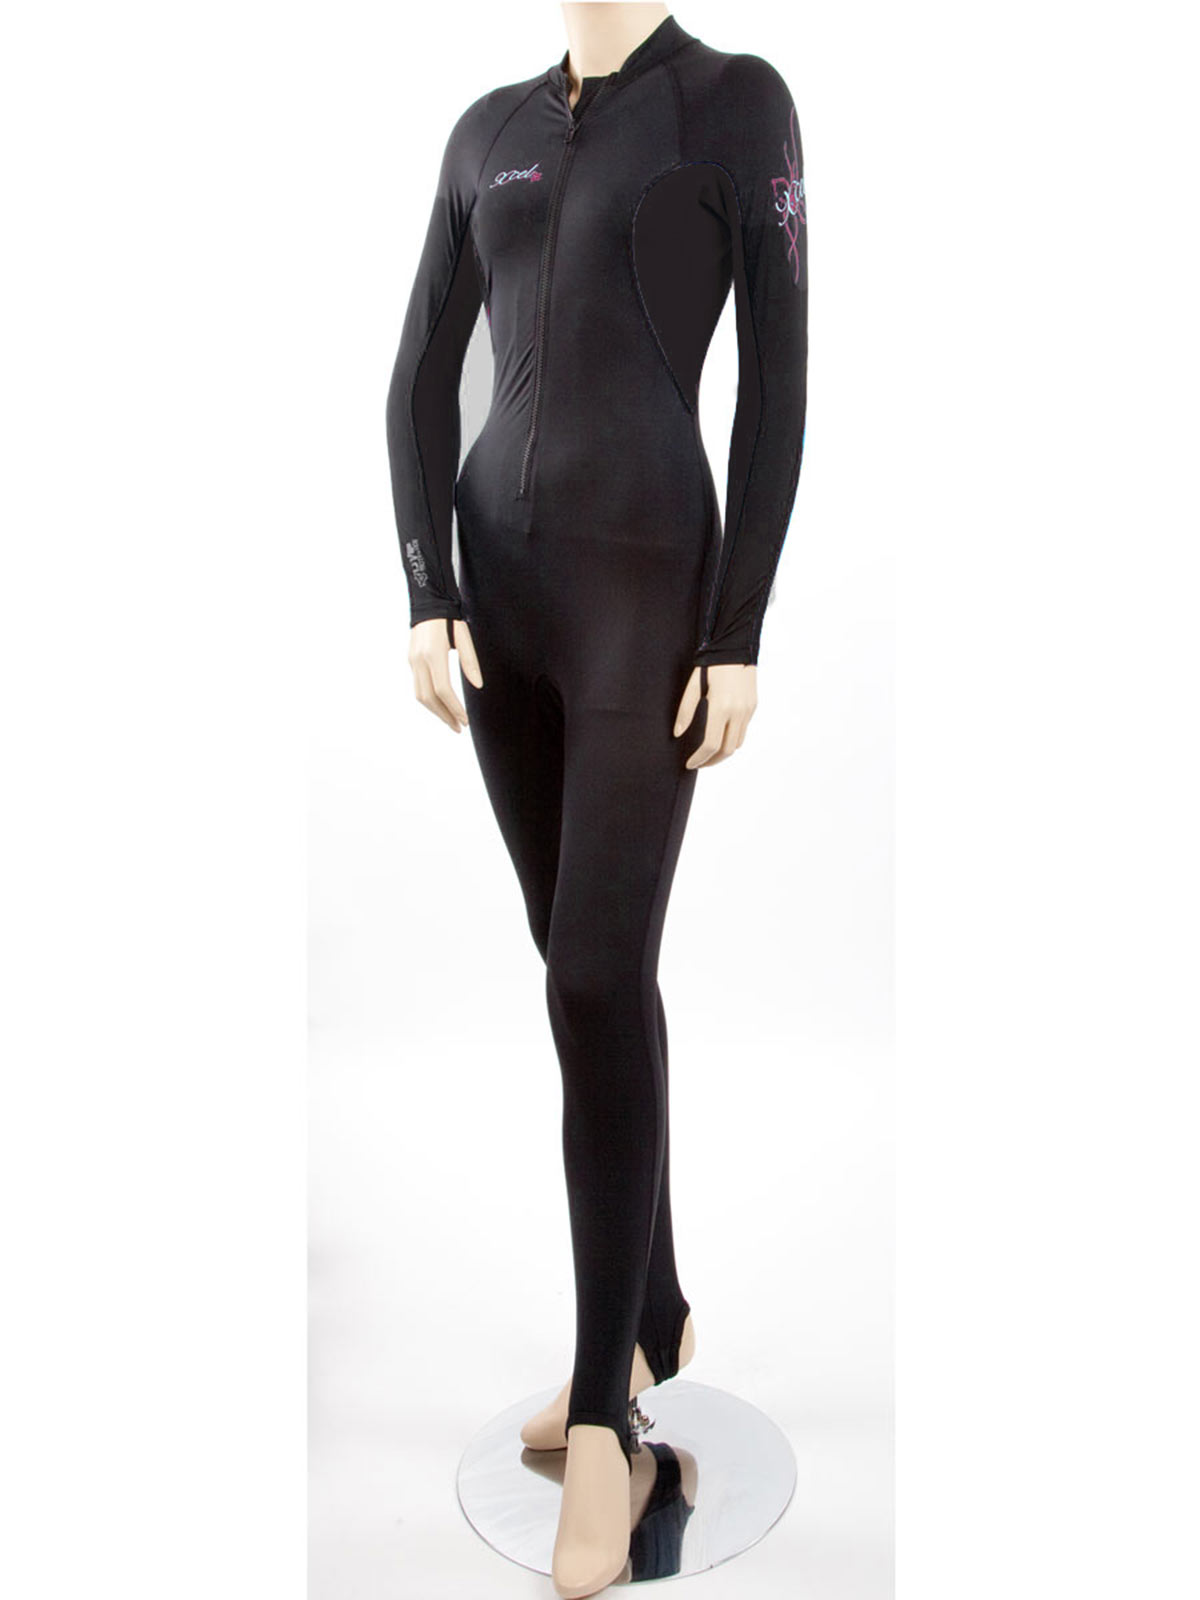 Xcel-Womens-Lycra-Dive-Skin-Full-Body-Suit-for-Scuba-Snorkel-Swim-Layering